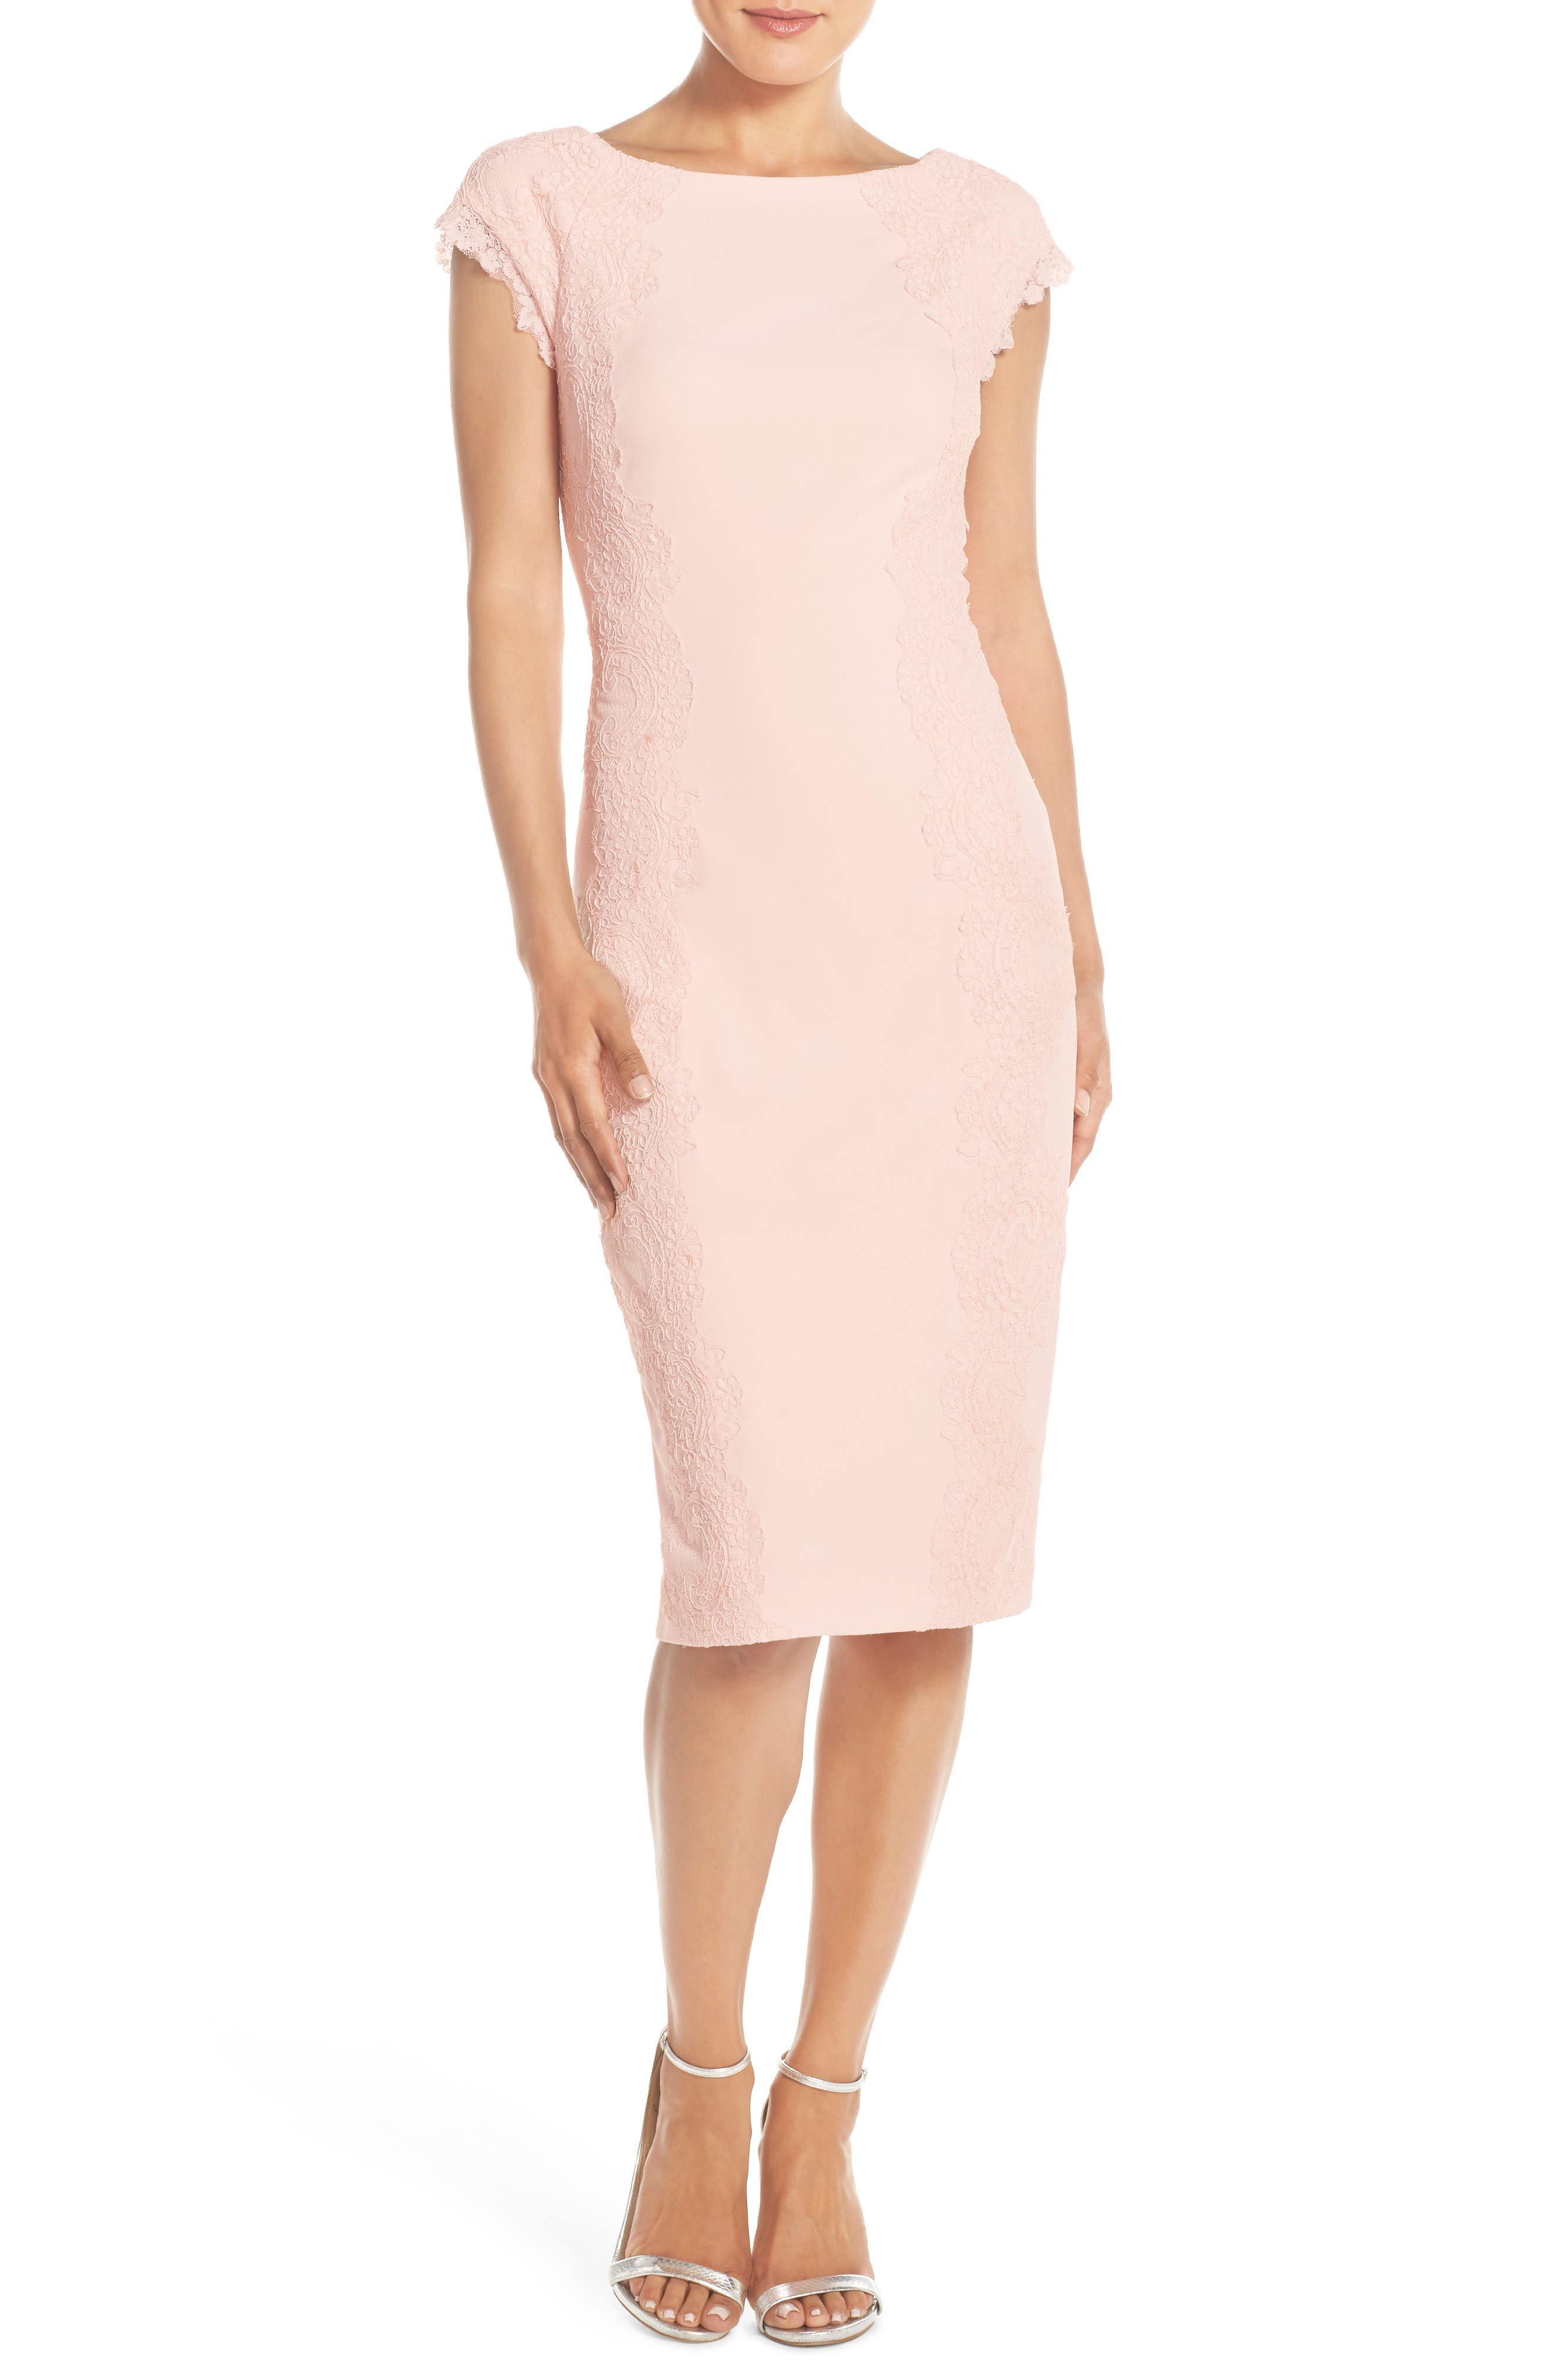 Main Image - Maggy London Lace Detail Crepe Sheath Dress (Regular & Petite)